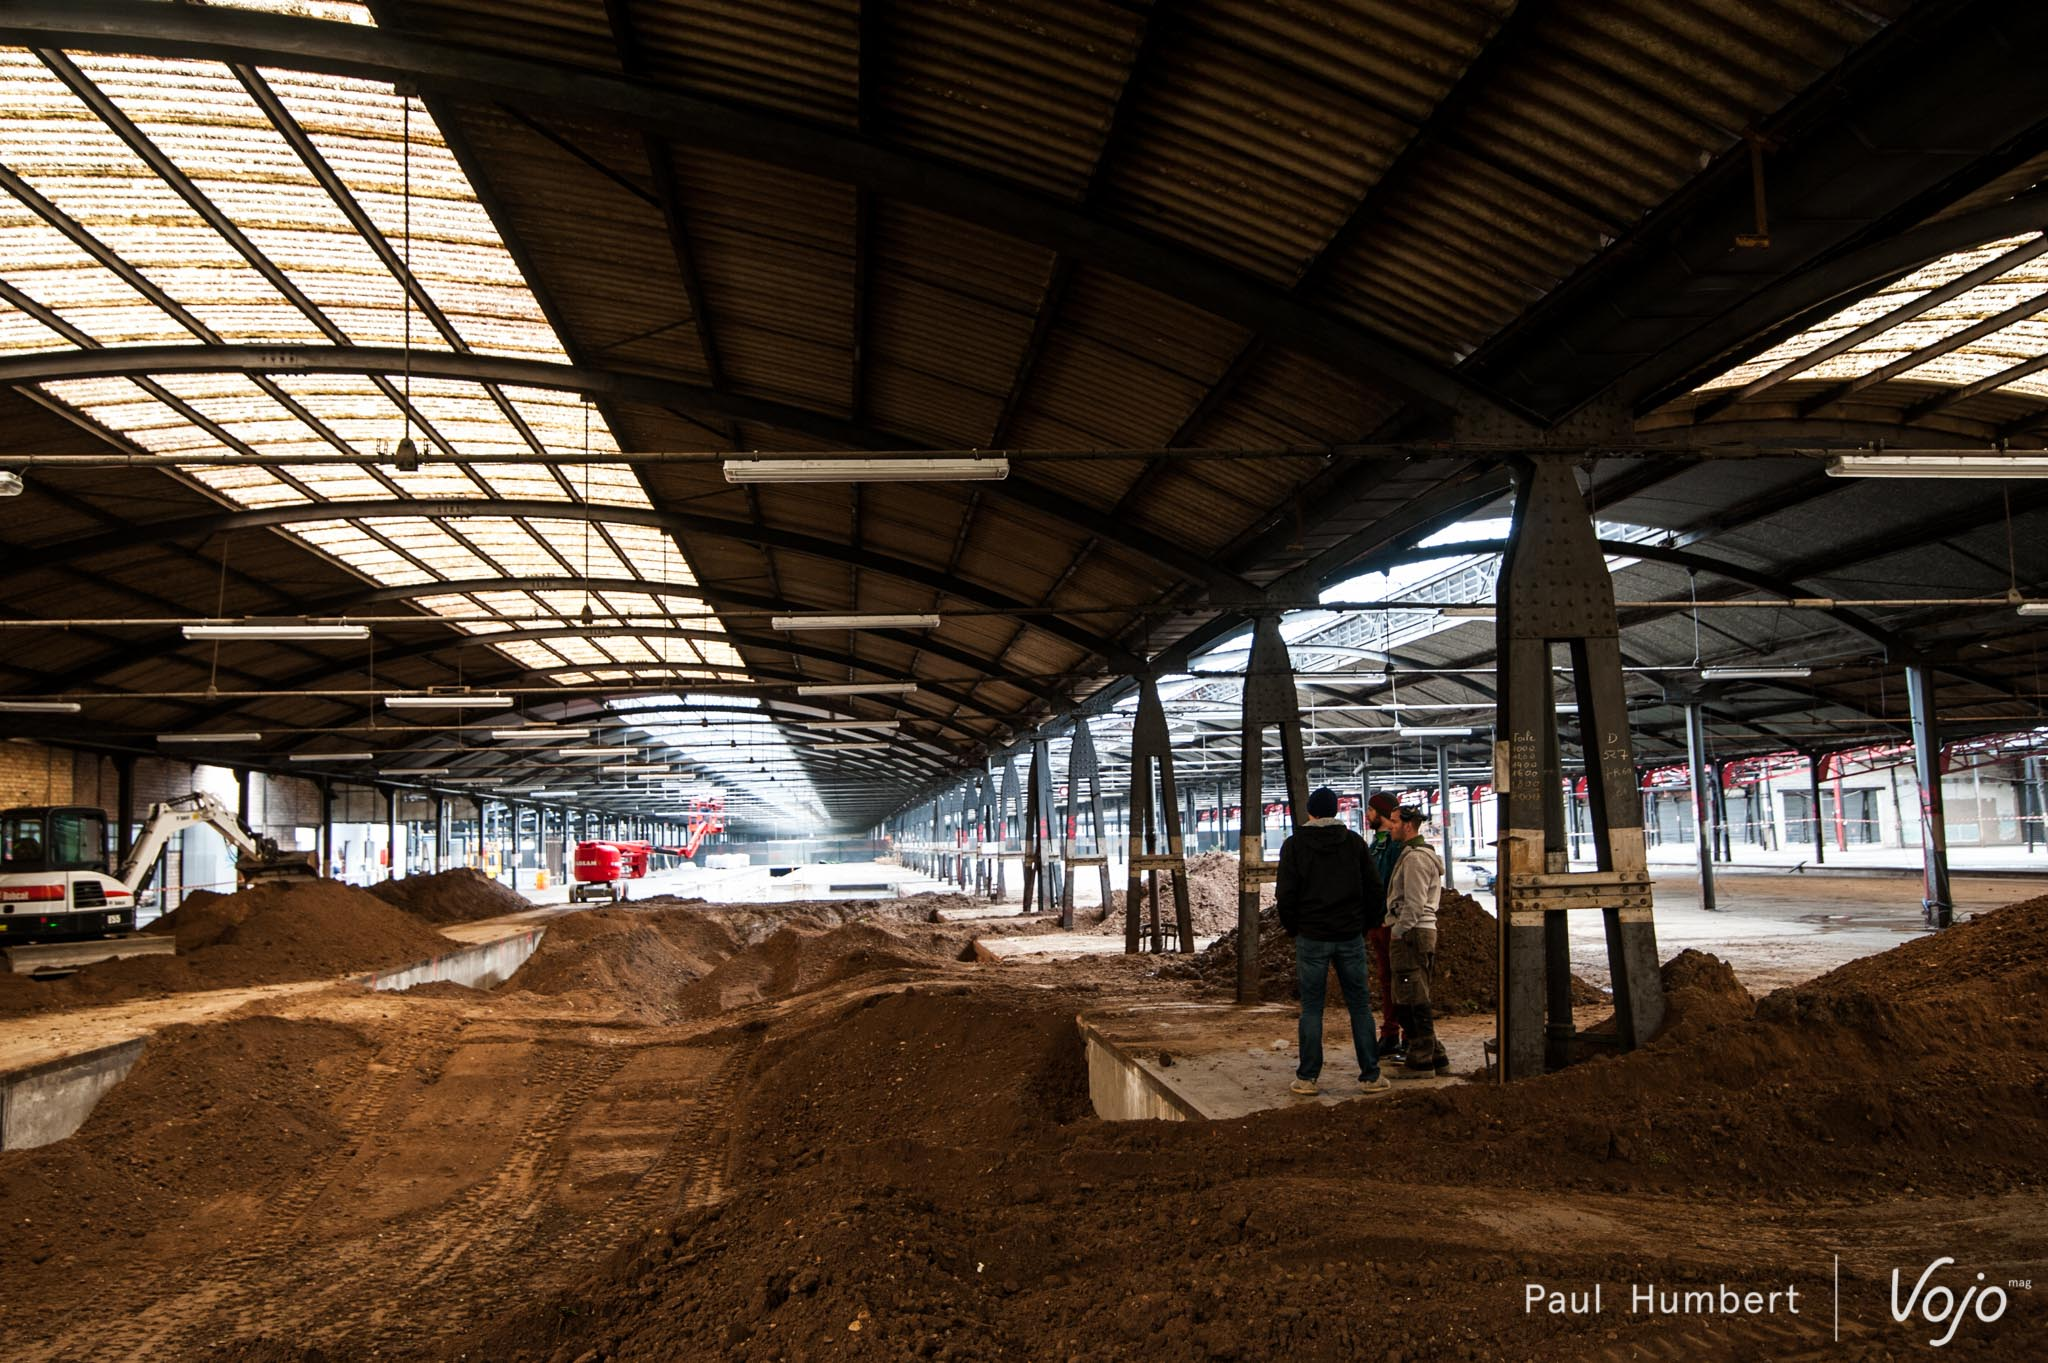 stride-bike-park-indoor-strasbourg-2016-vojo-paul-humbert-11